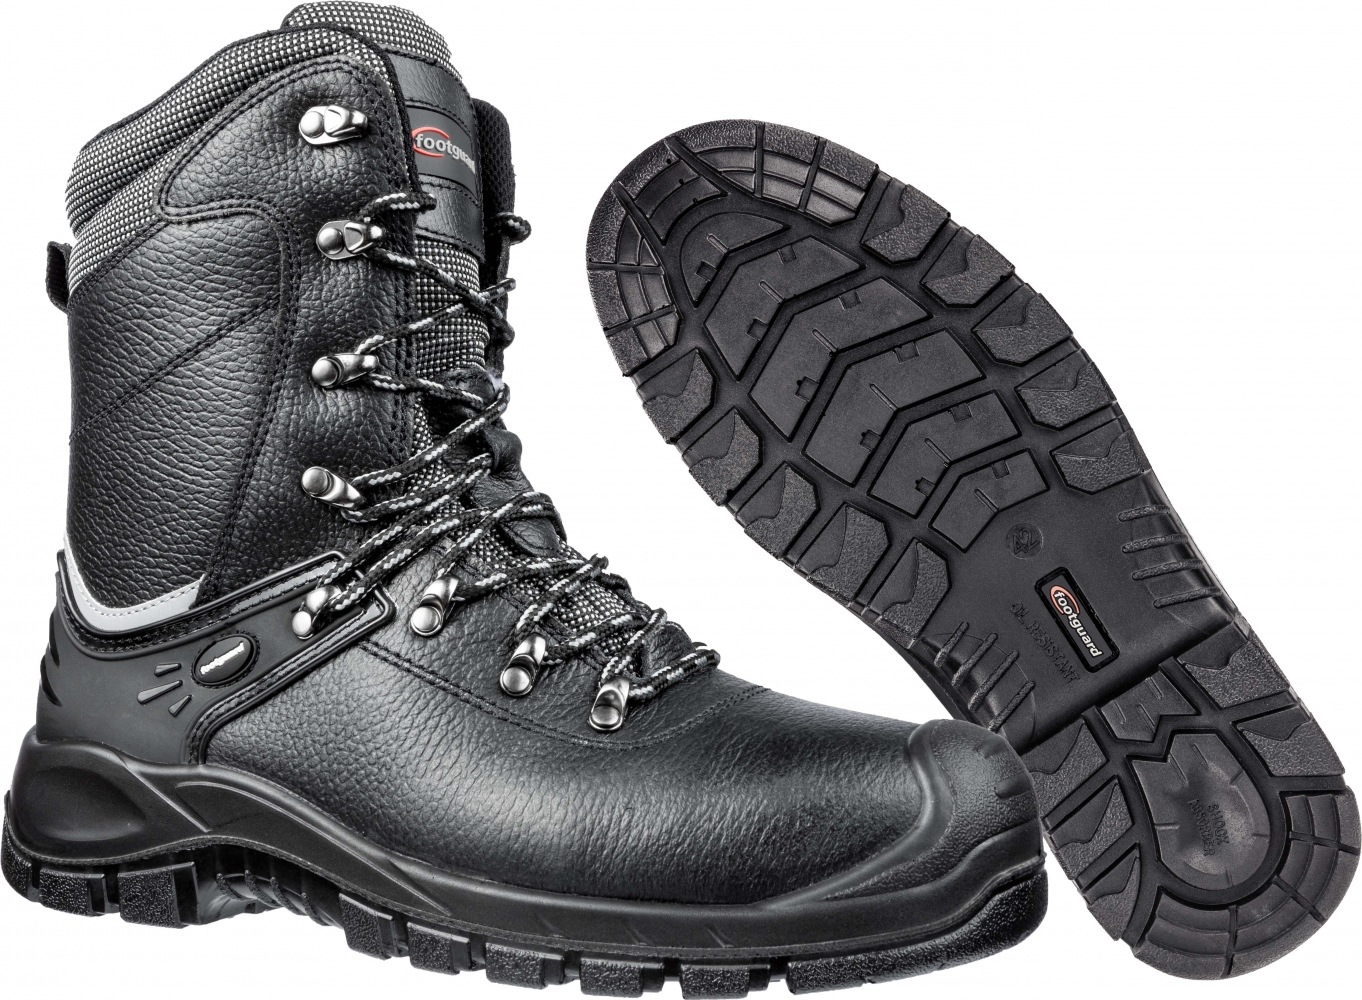 brand new 71292 c89d0 Footguard 631831 NORDIC HIGH Winter Sicherheitsstiefel S3 SRC CI